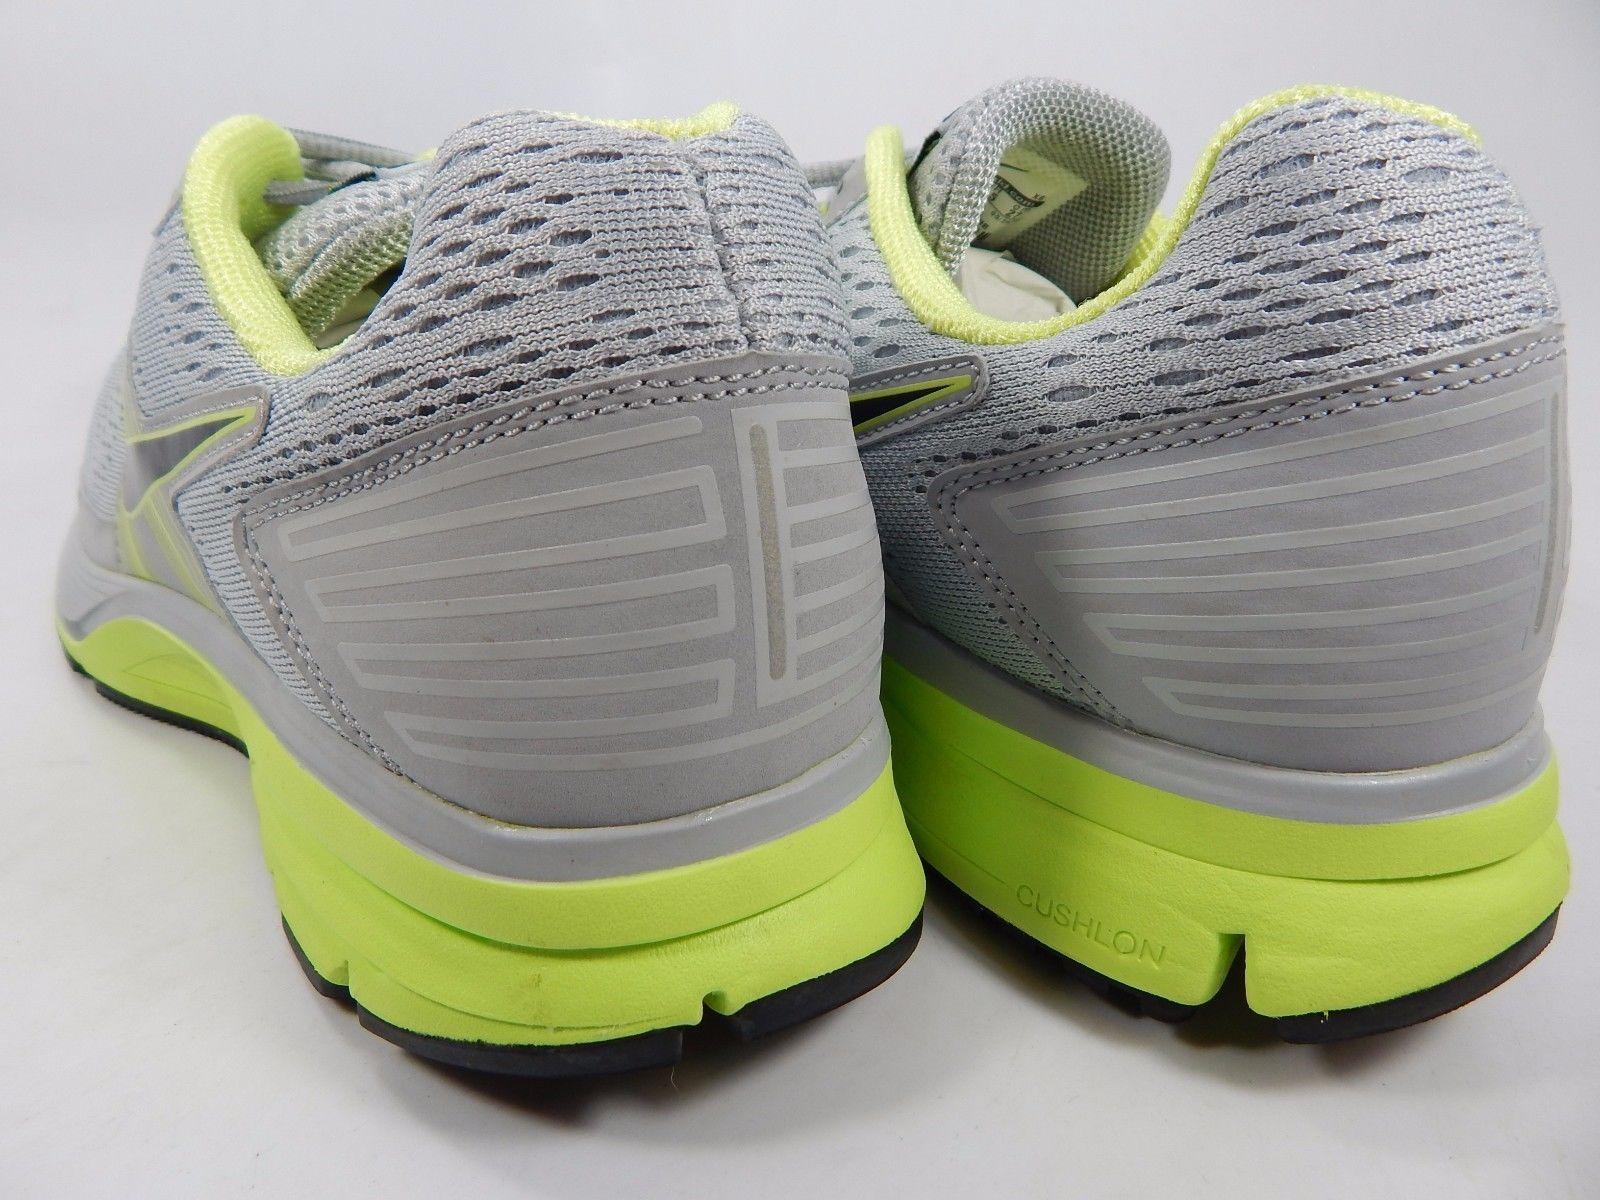 size 29 in us shoes style guru fashion glitz